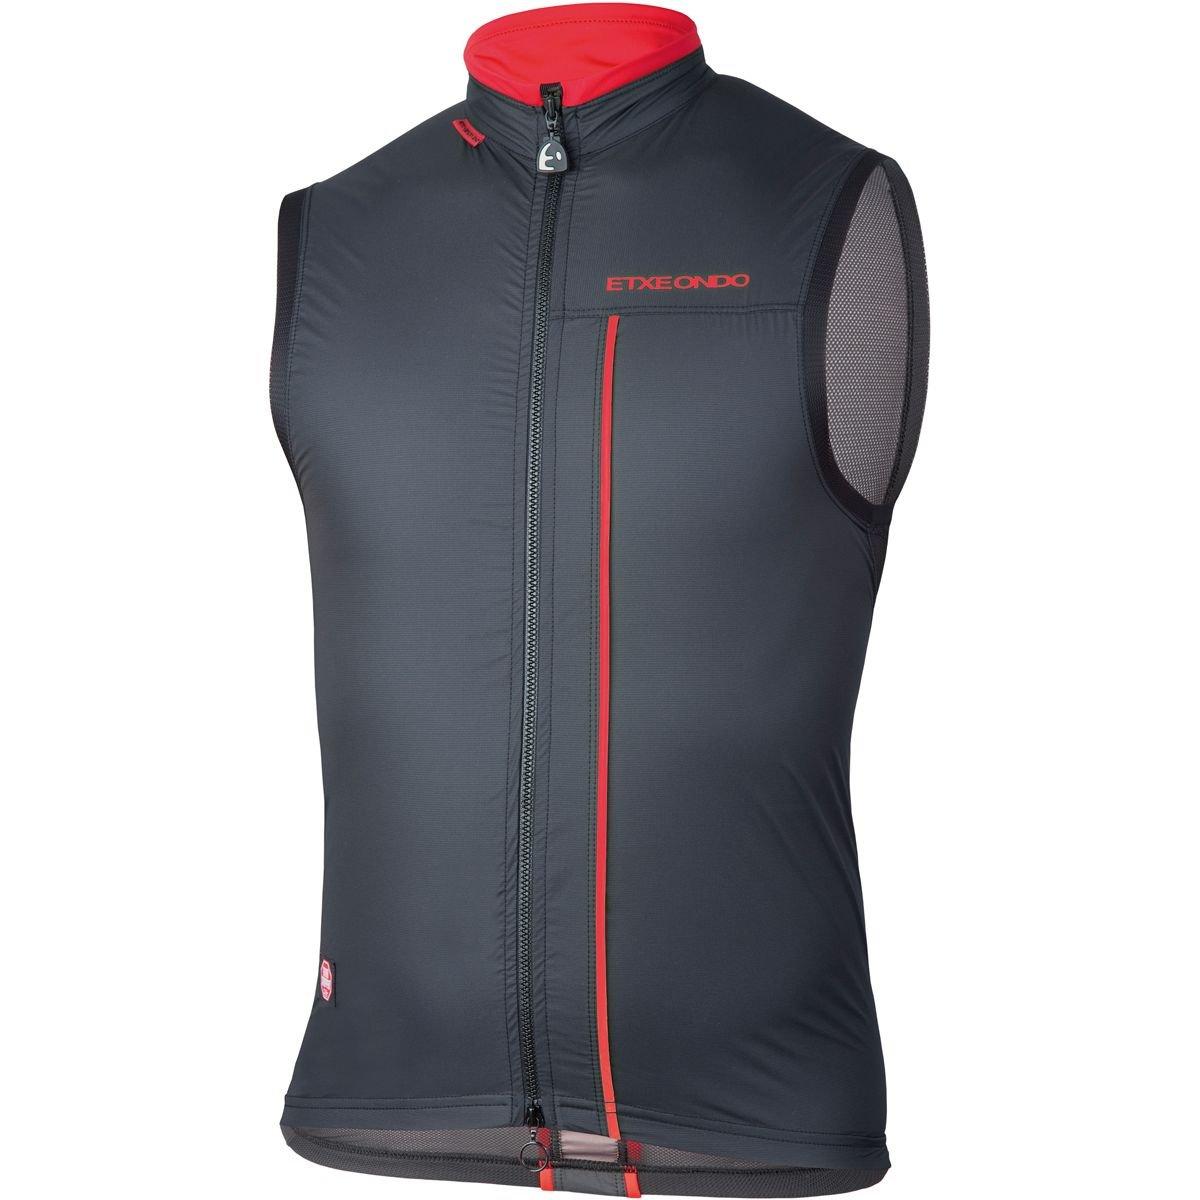 ETXEONDO Gilet Ligero Vest Men schwarz ROT 2018 Fahrradweste